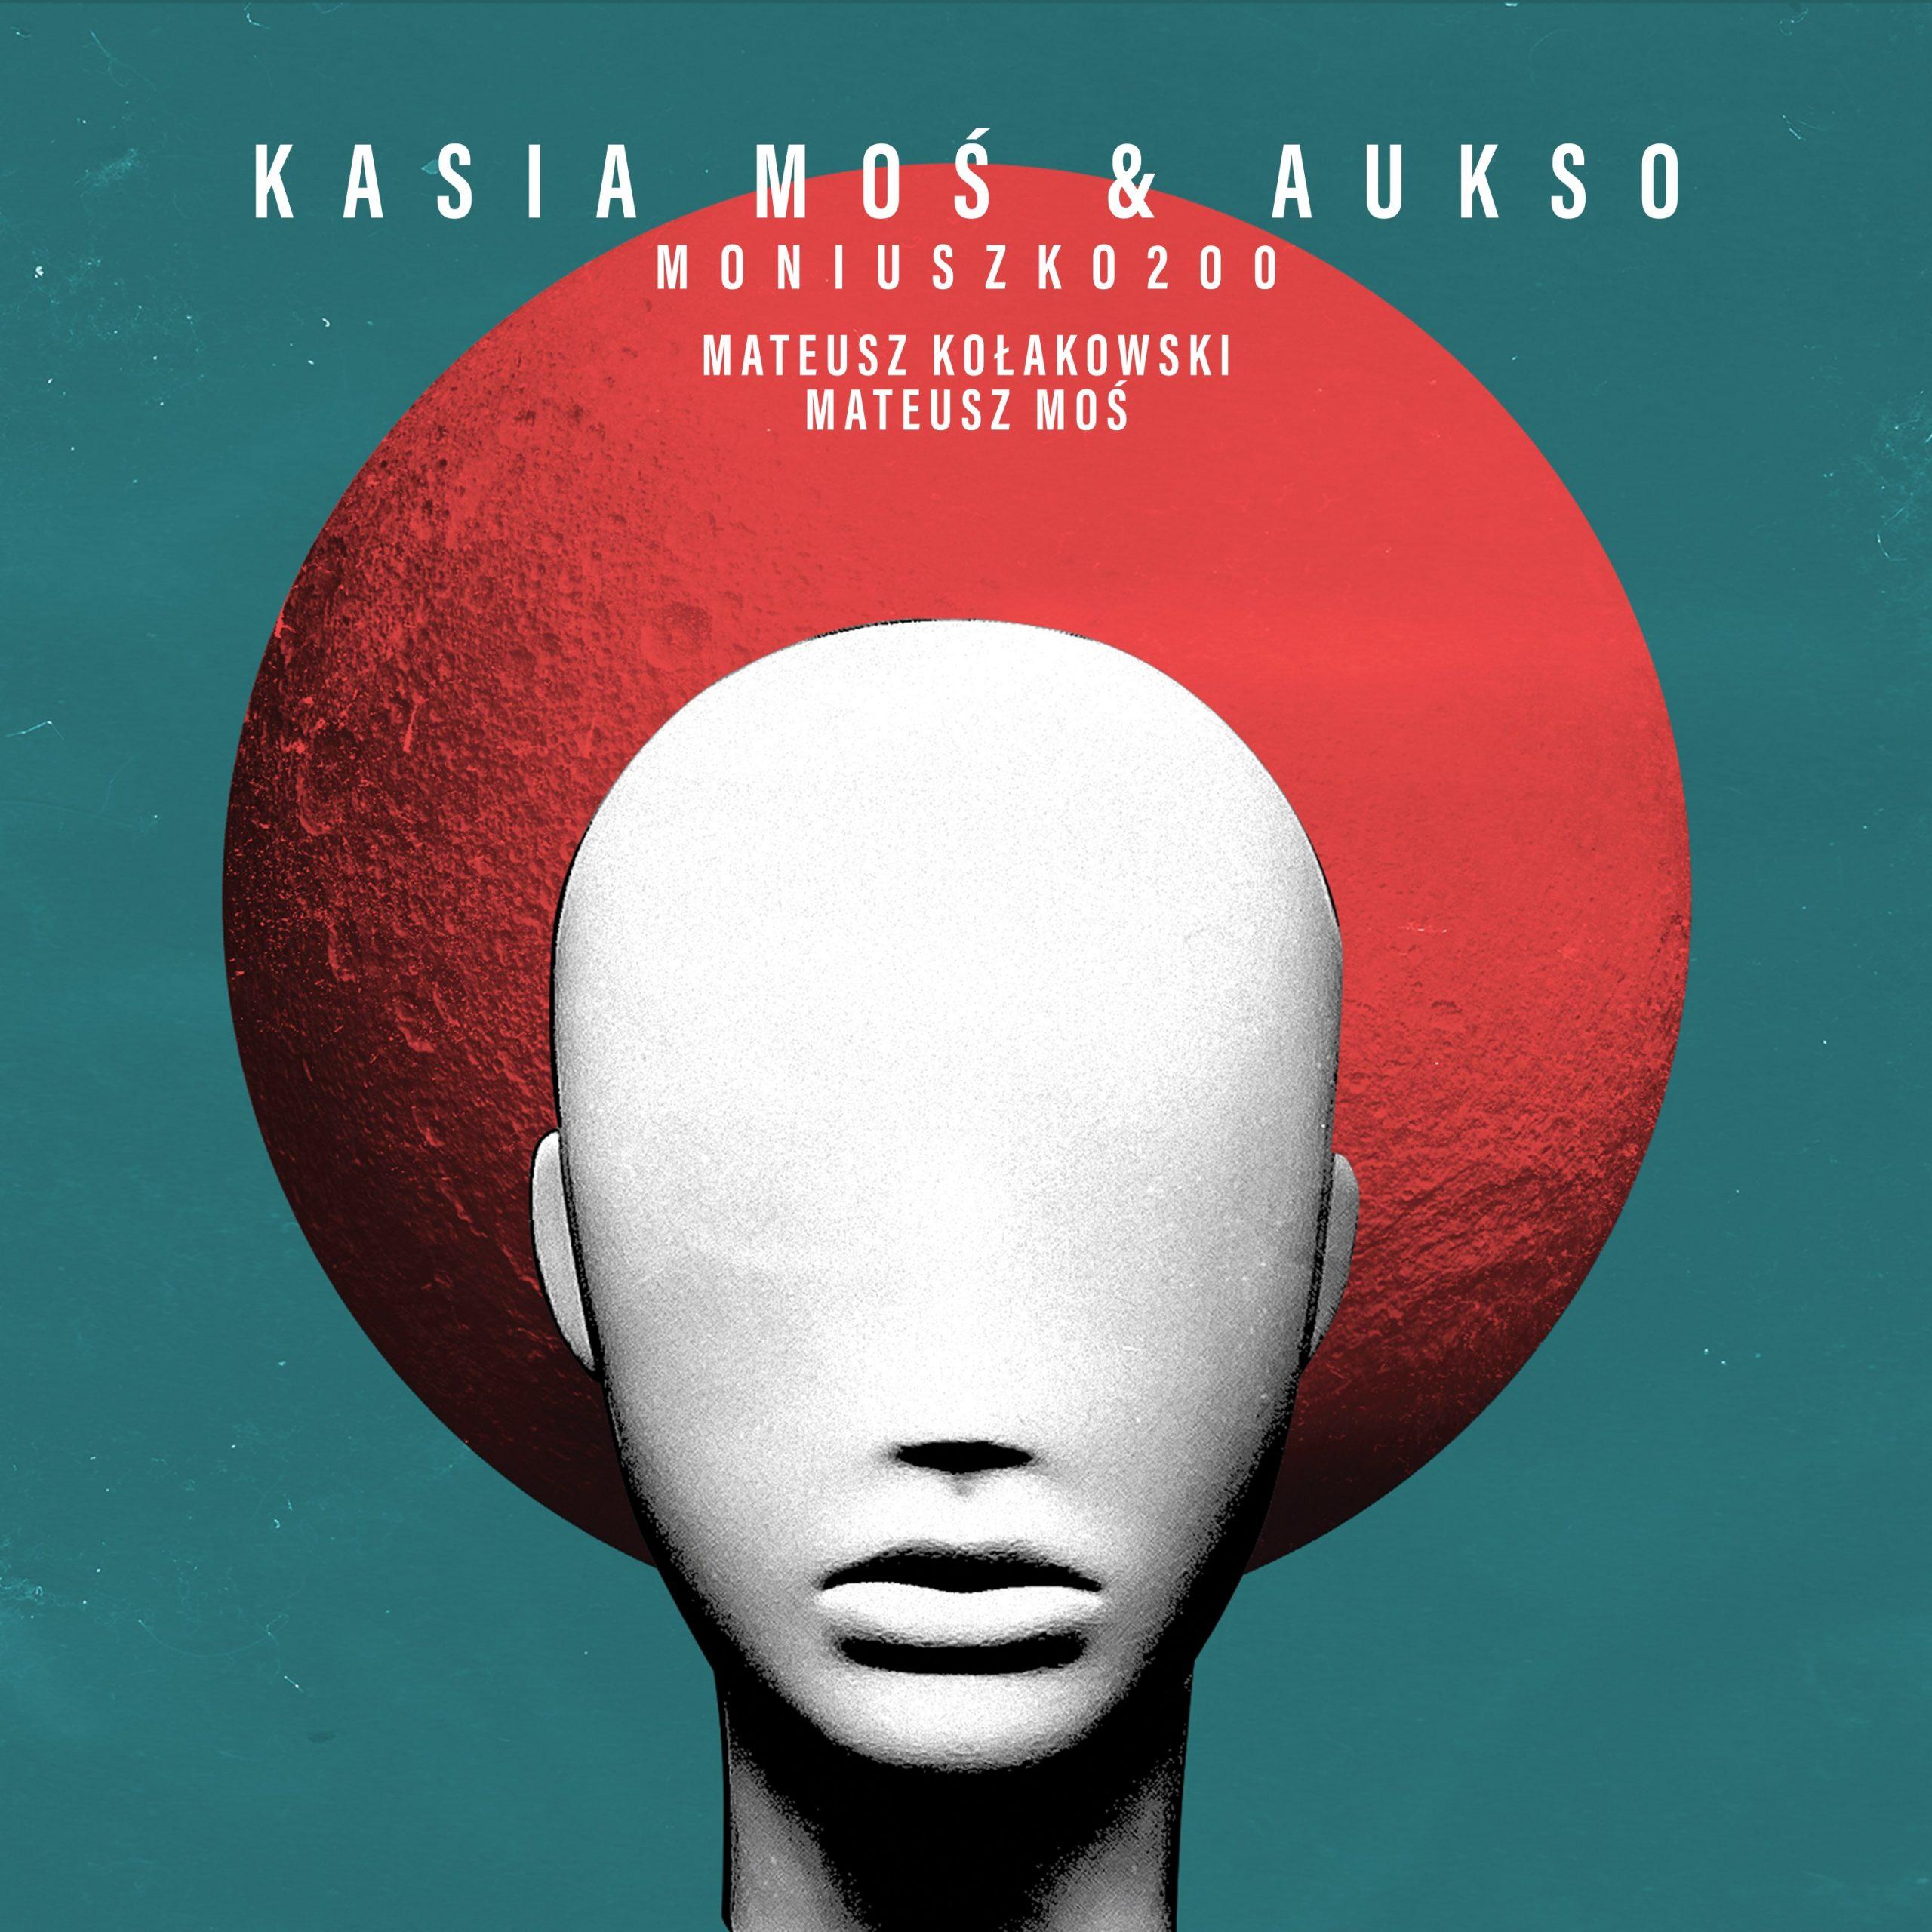 Kasia Moś, Moniuszko200